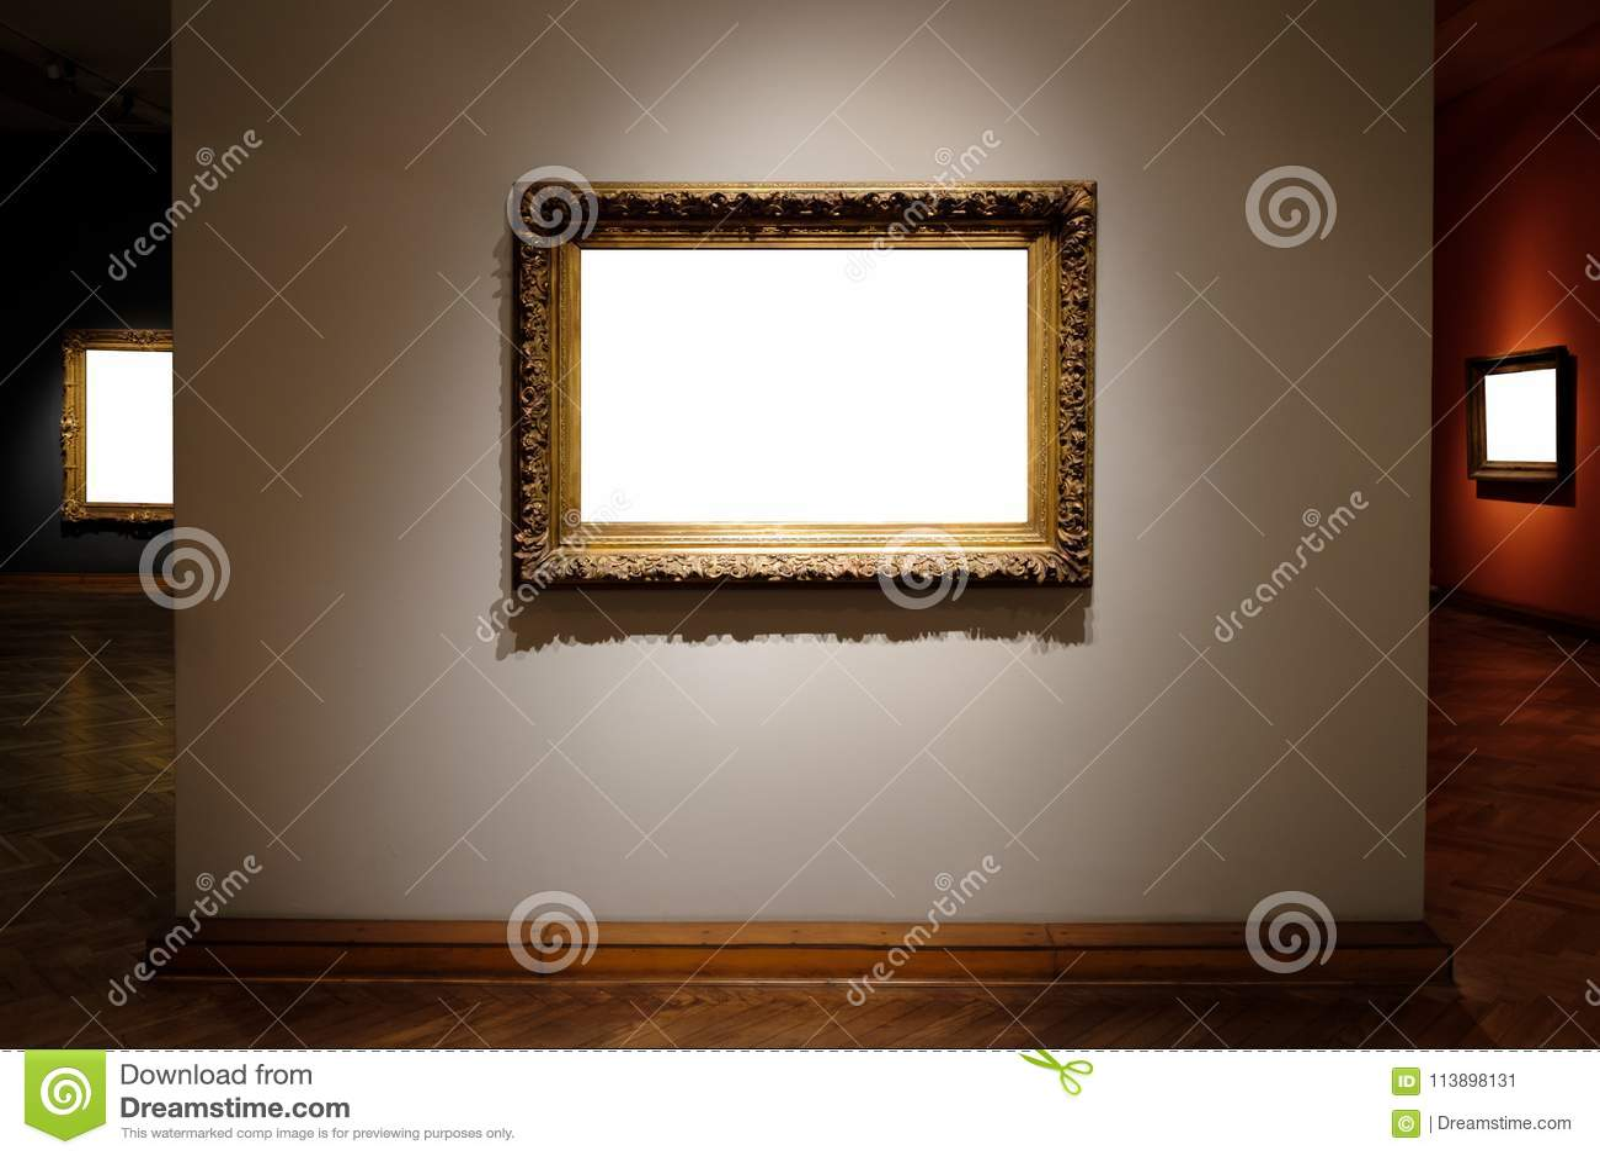 O branco ornamentado de Art Gallery Museum Exhibit Blank das molduras para retrato isolou o trajeto de grampeamento na galeria